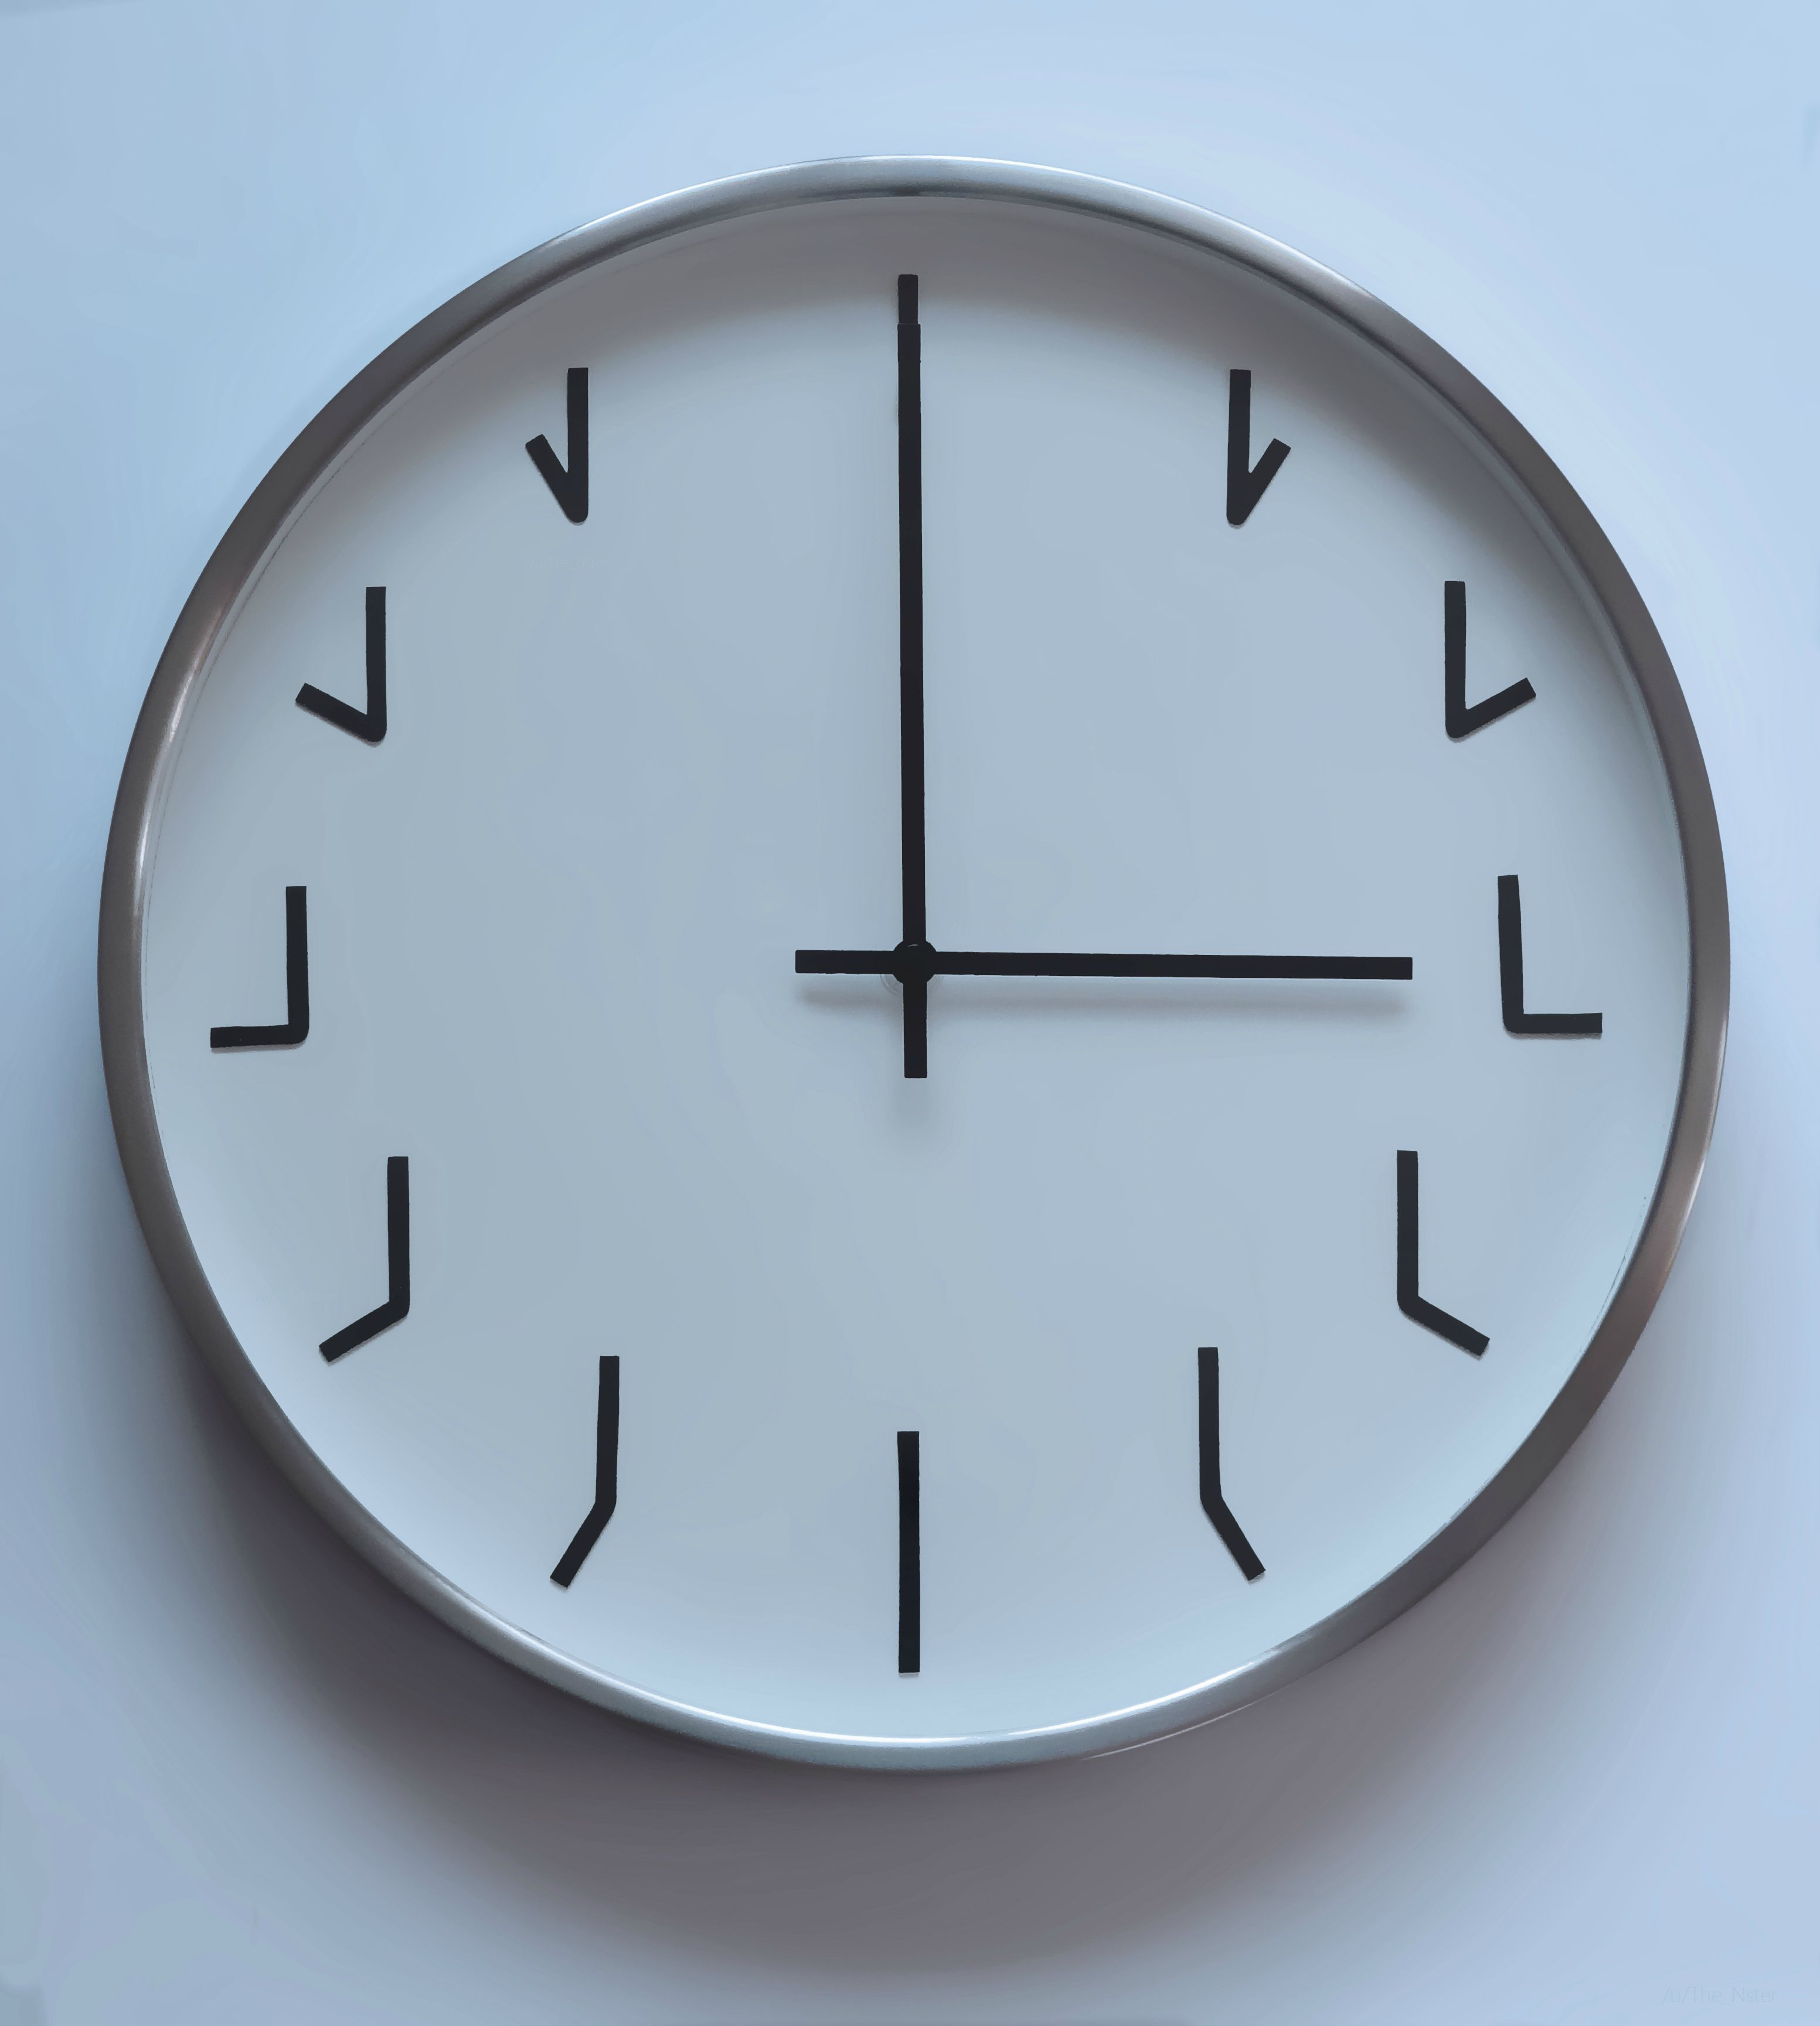 Redundant Clock this does my head